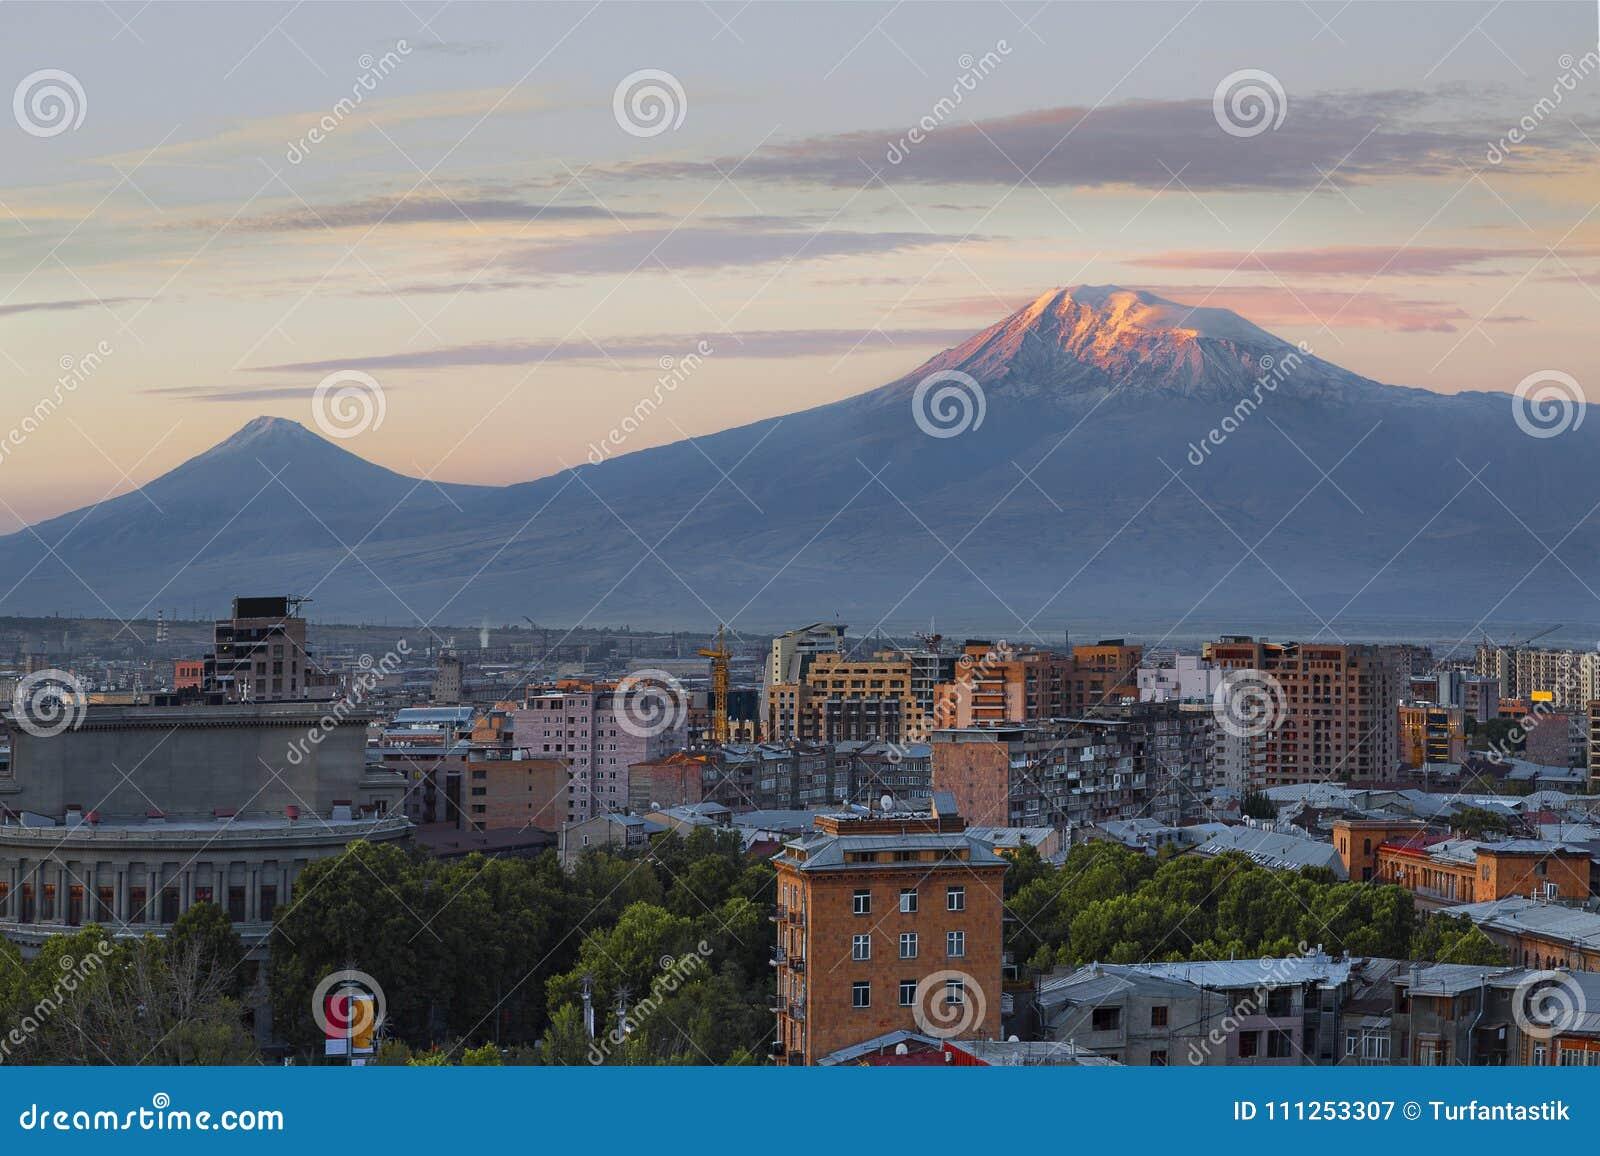 Jerevan, πρωτεύουσα της Αρμενίας στην ανατολή με τις δύο αιχμές του υποστηρίγματος Ararat στο υπόβαθρο